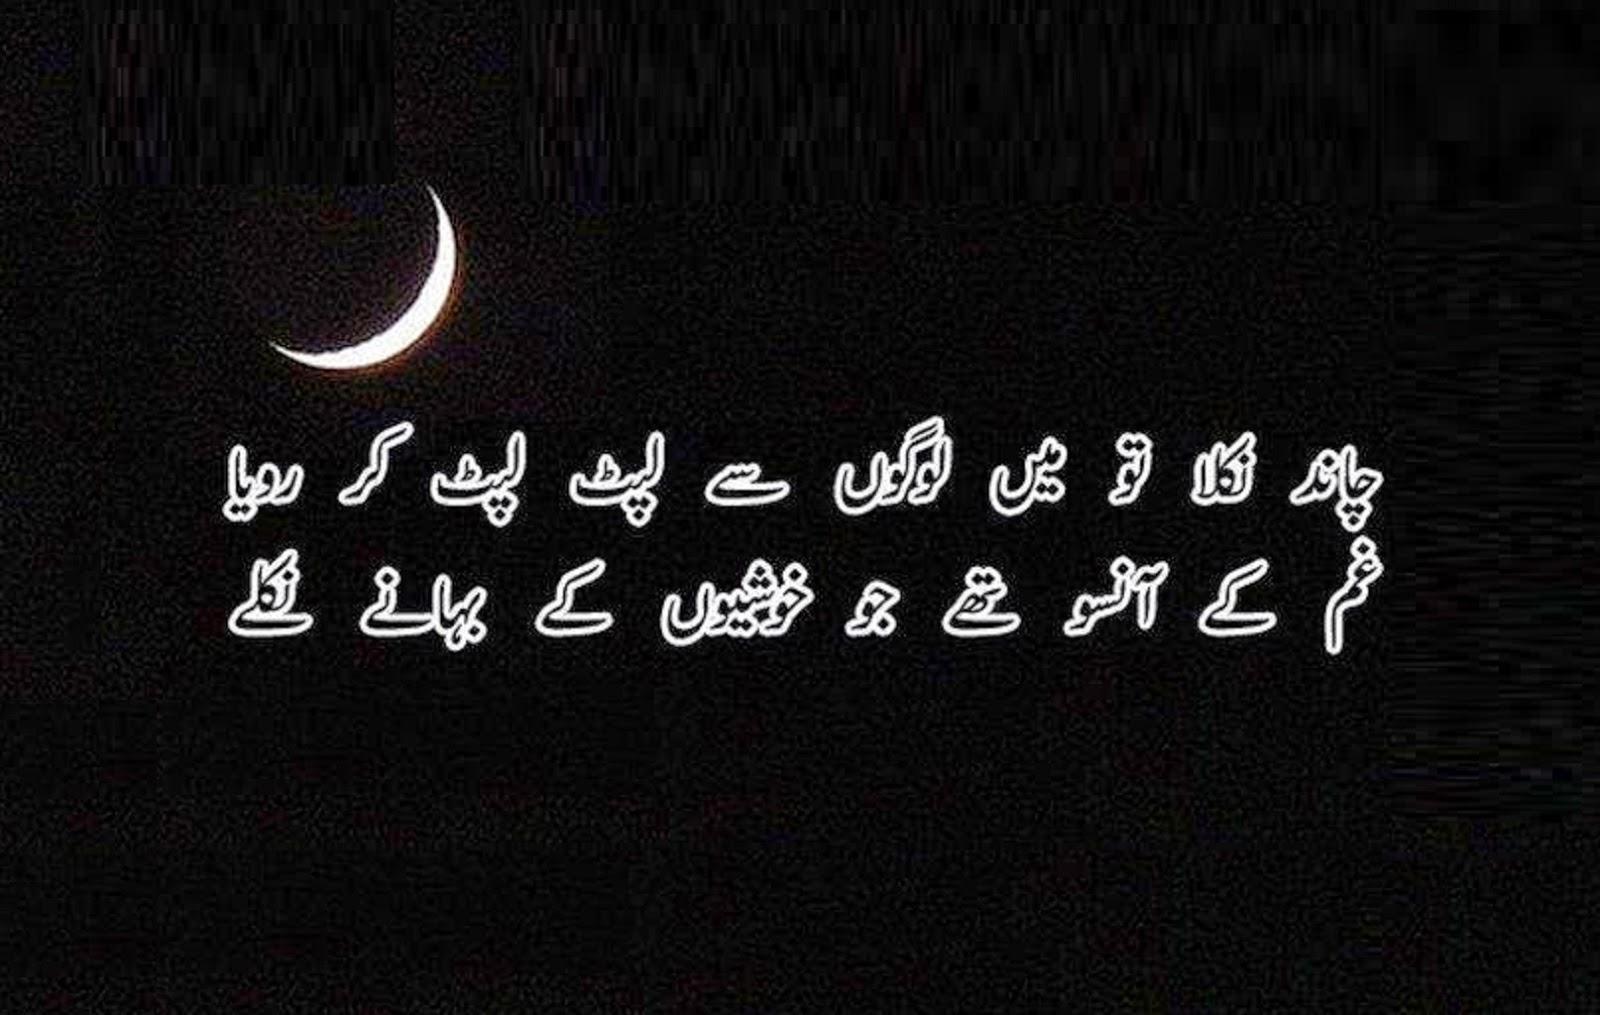 Download HD Wallpapers 3D Beautiful Sad Urdu Poetry HD 1600x1015